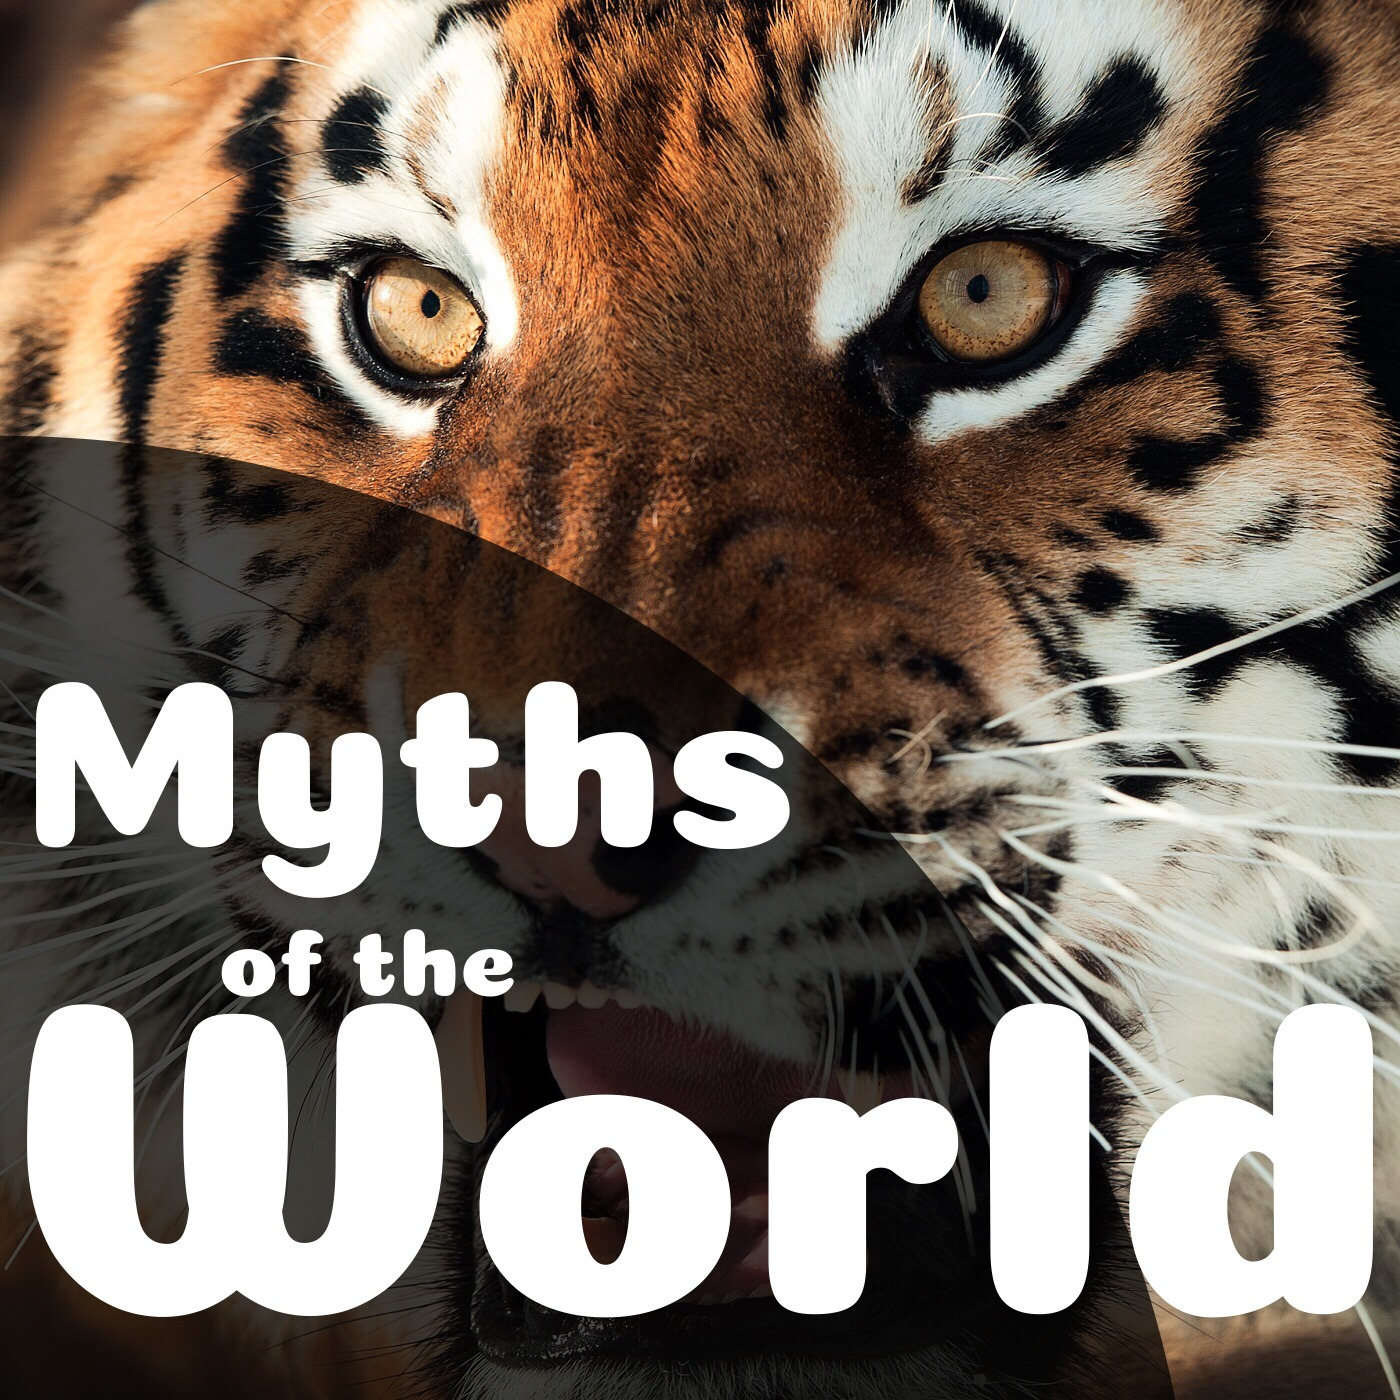 World Myths Ep. 3 - II. Koschei the Deathless